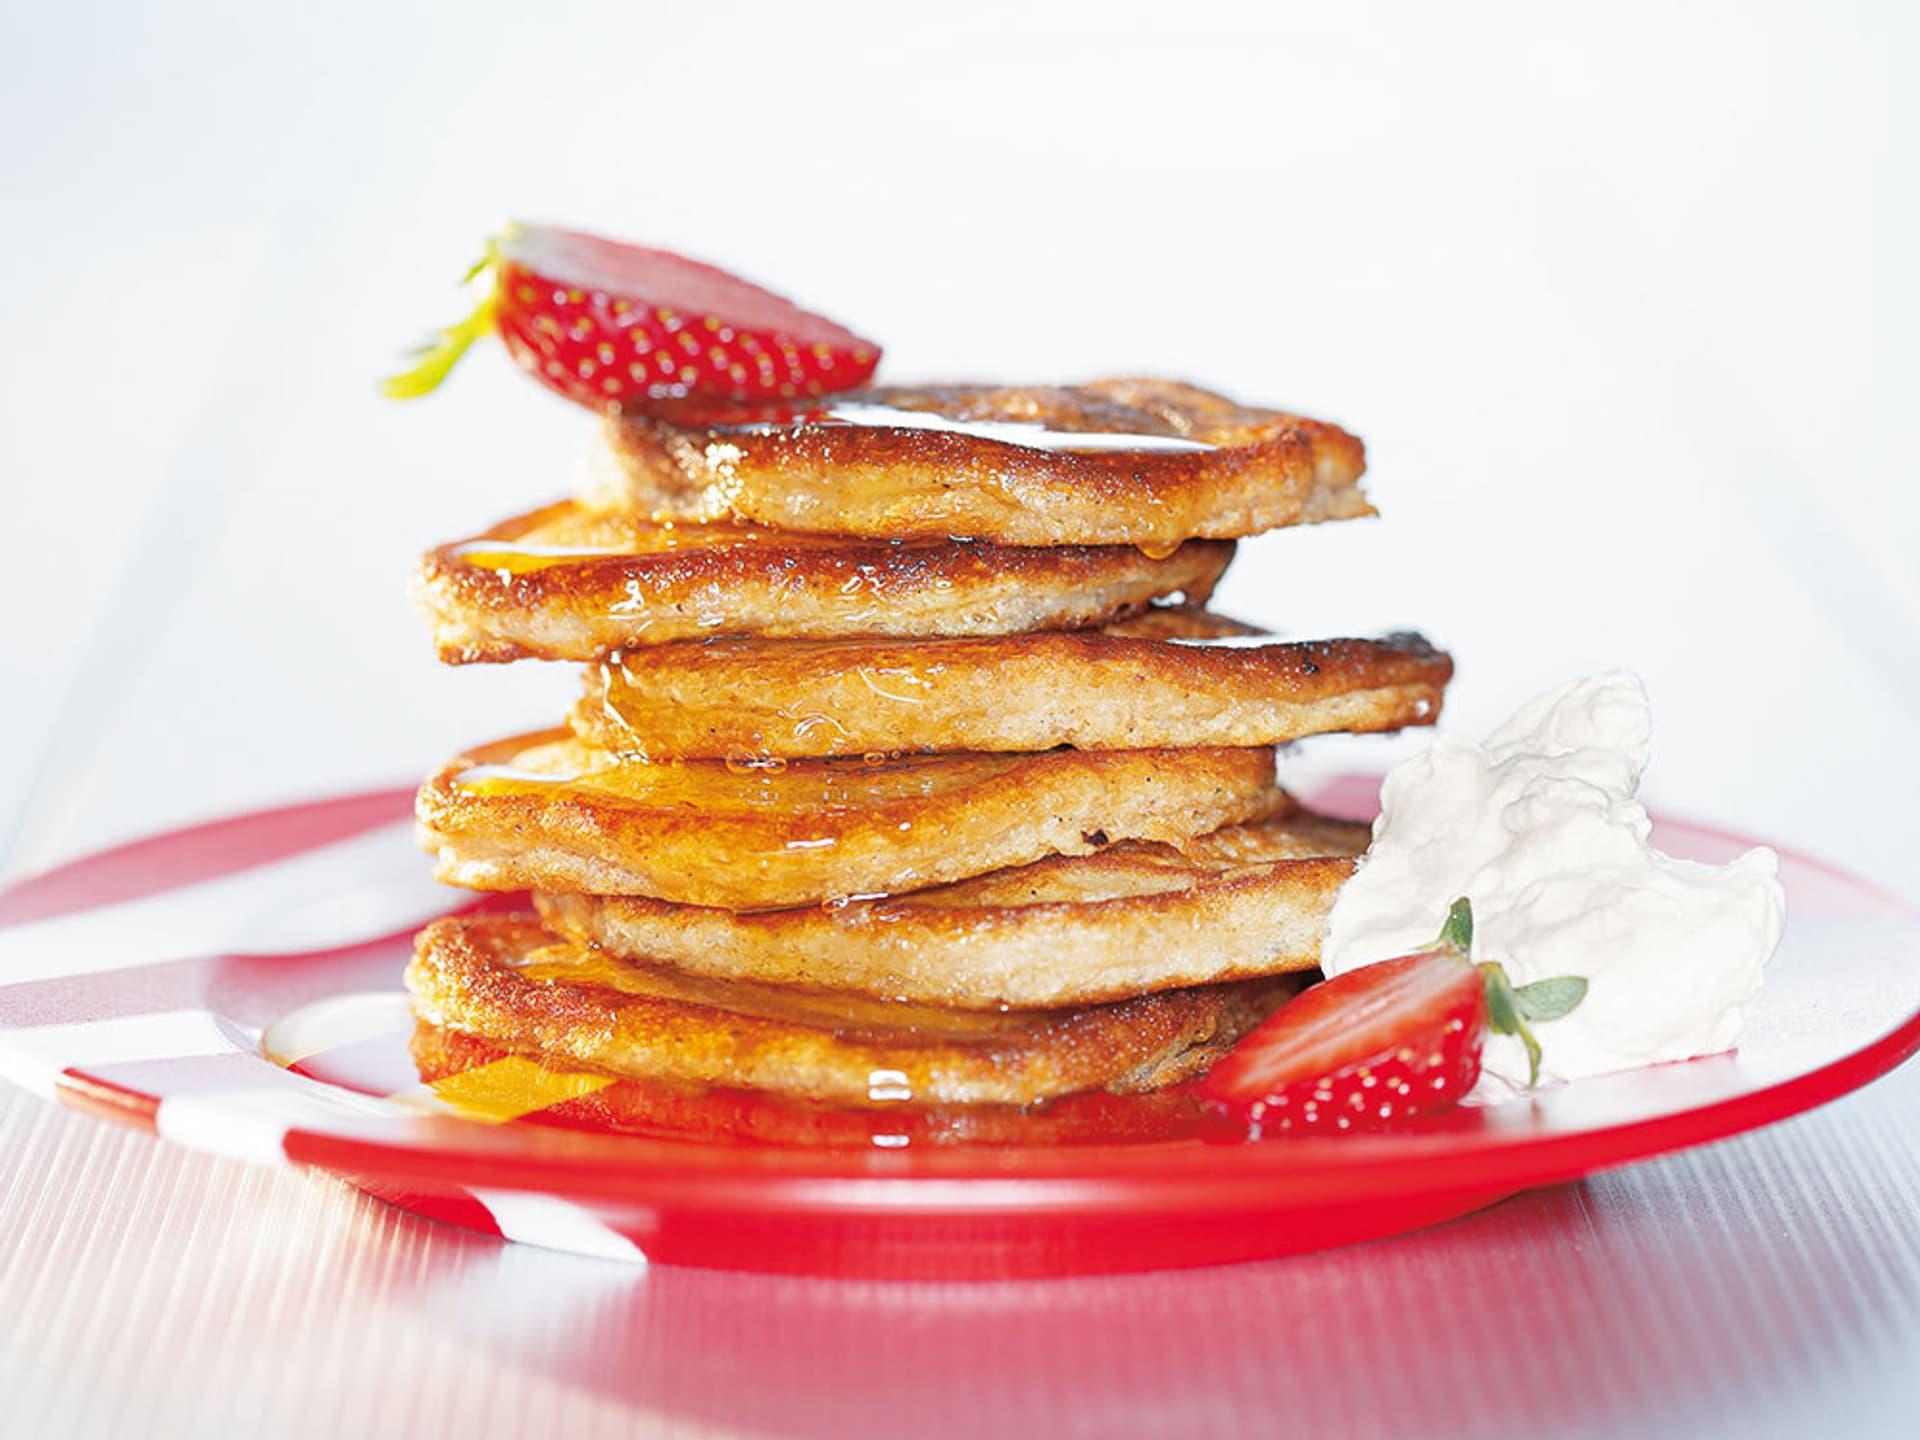 Stapel Pancakes mit einer Erdbeere